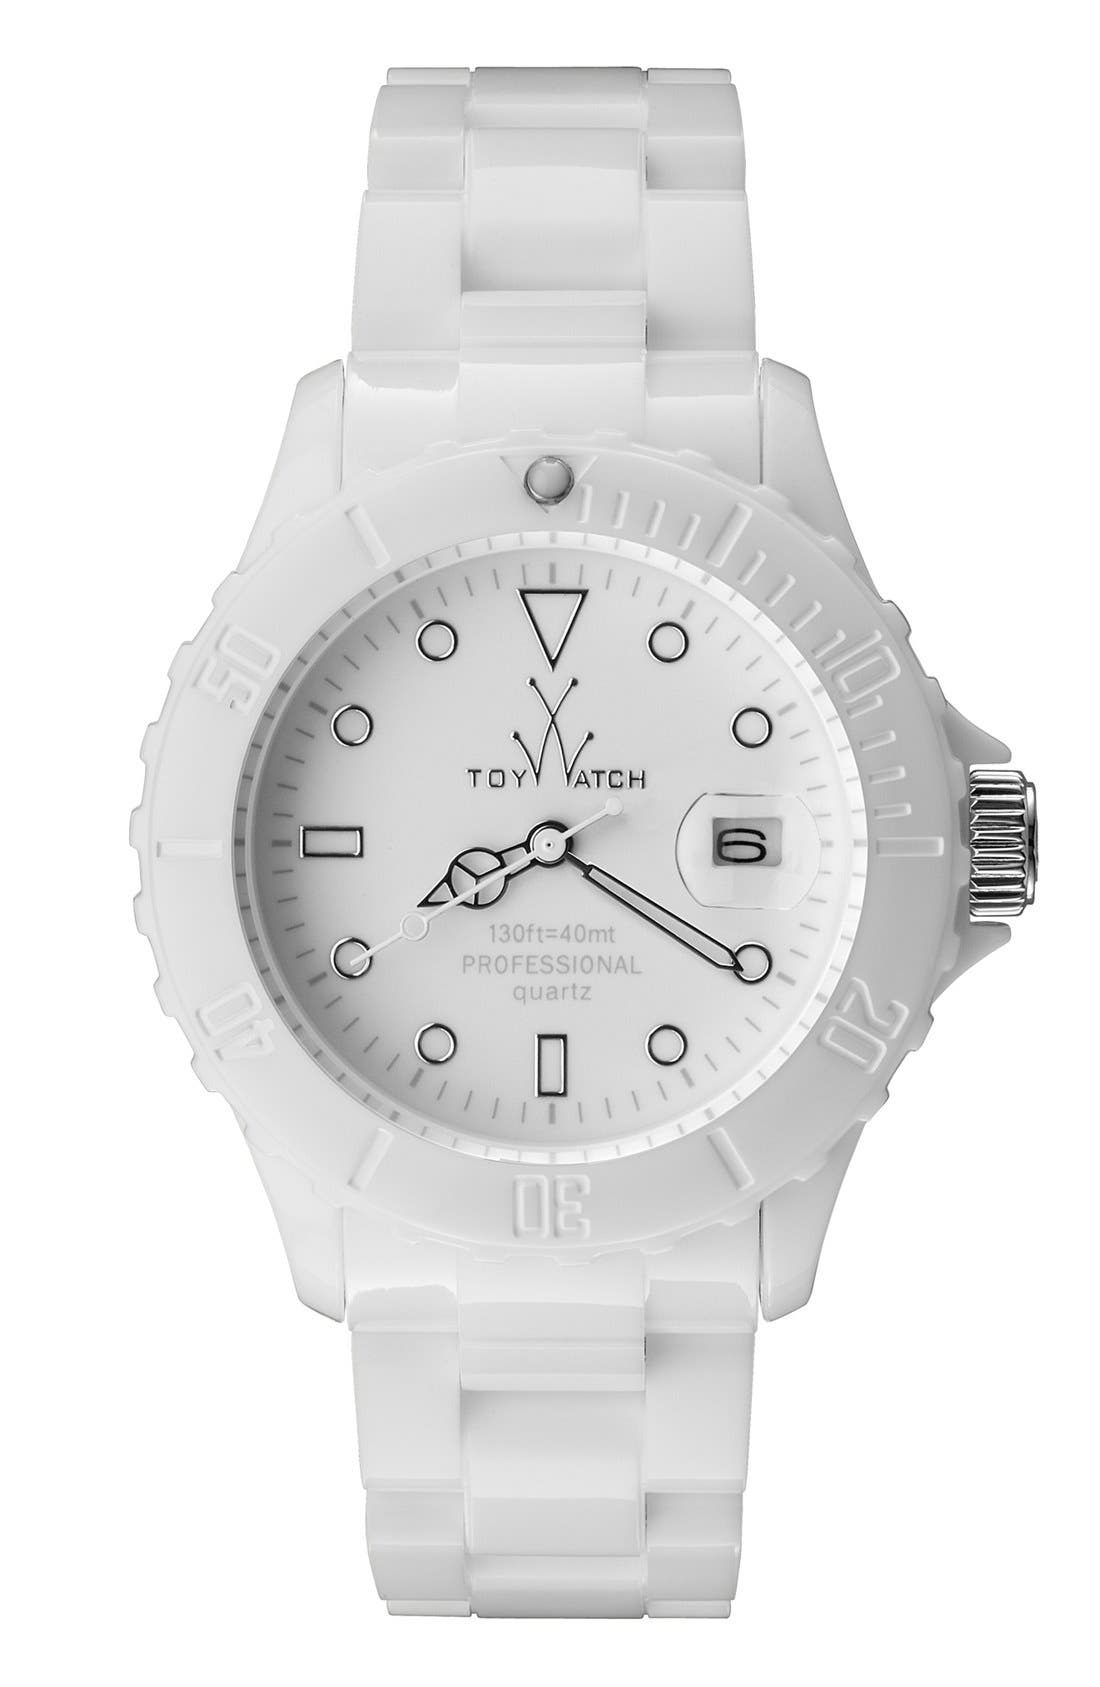 Main Image - TOYWATCH 'Monochrome' Bracelet Watch, 39mm